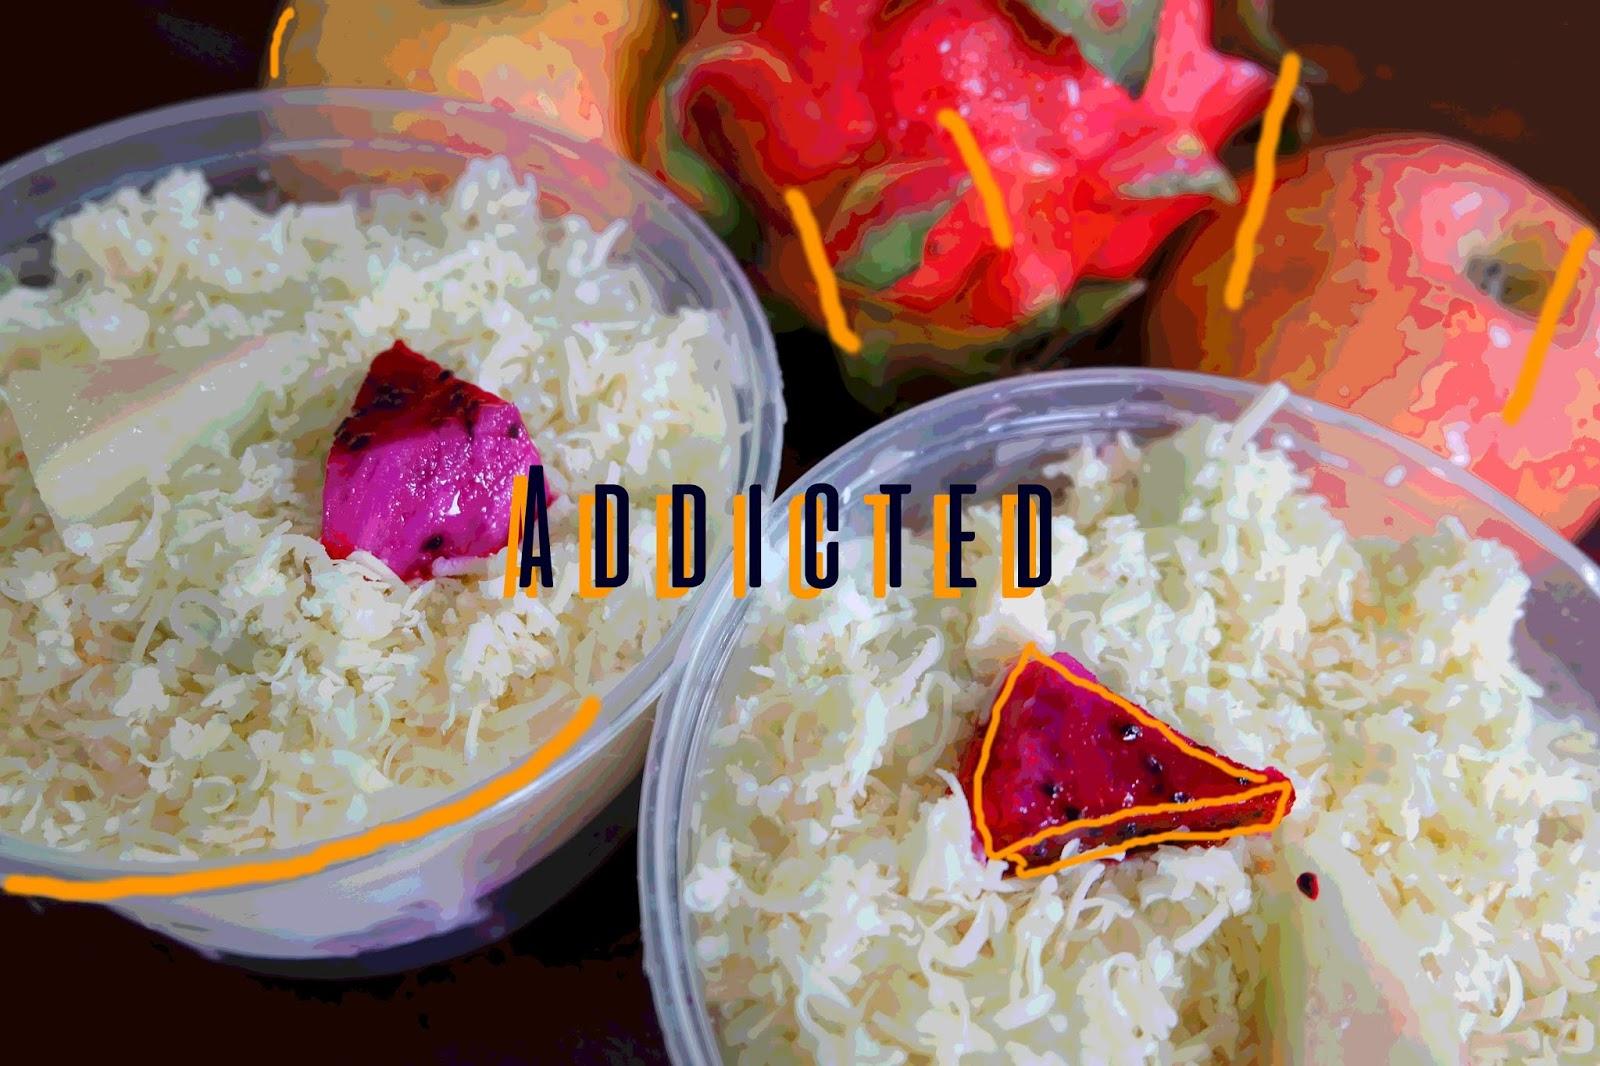 Addicted - Theory of Loving Food 🍓